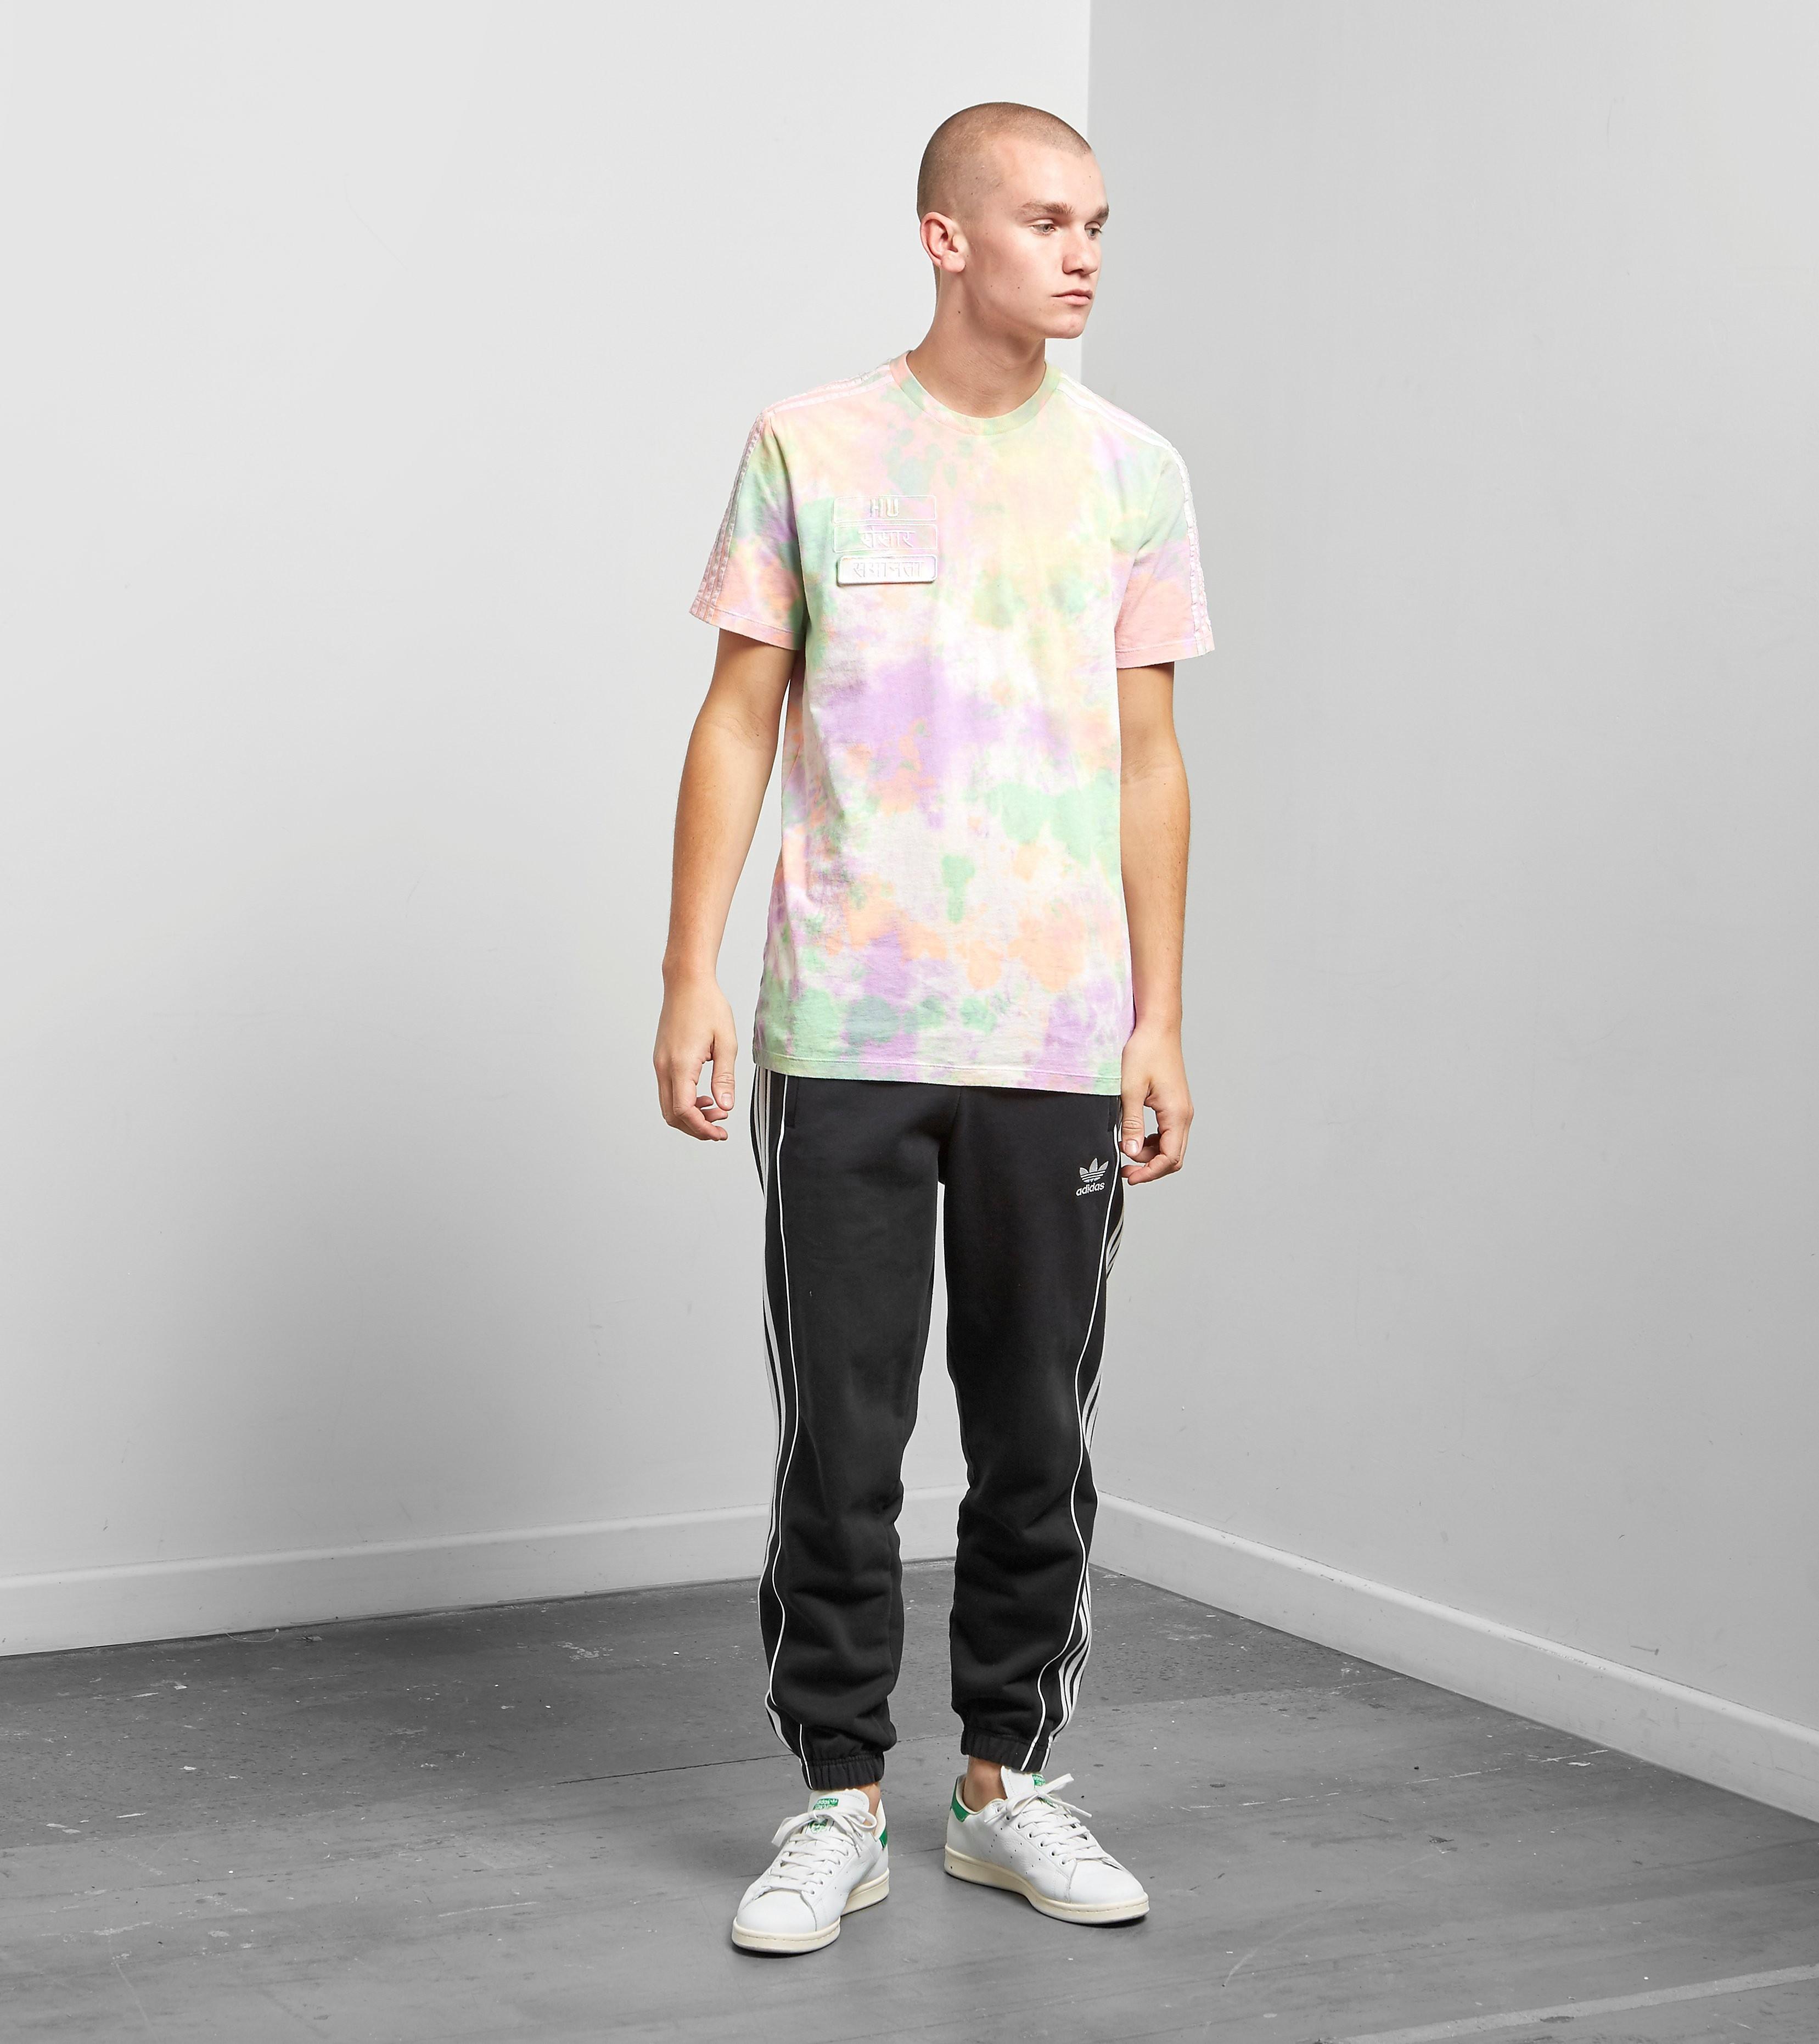 adidas Originals x Pharrell Williams Hu Holi T-Shirt